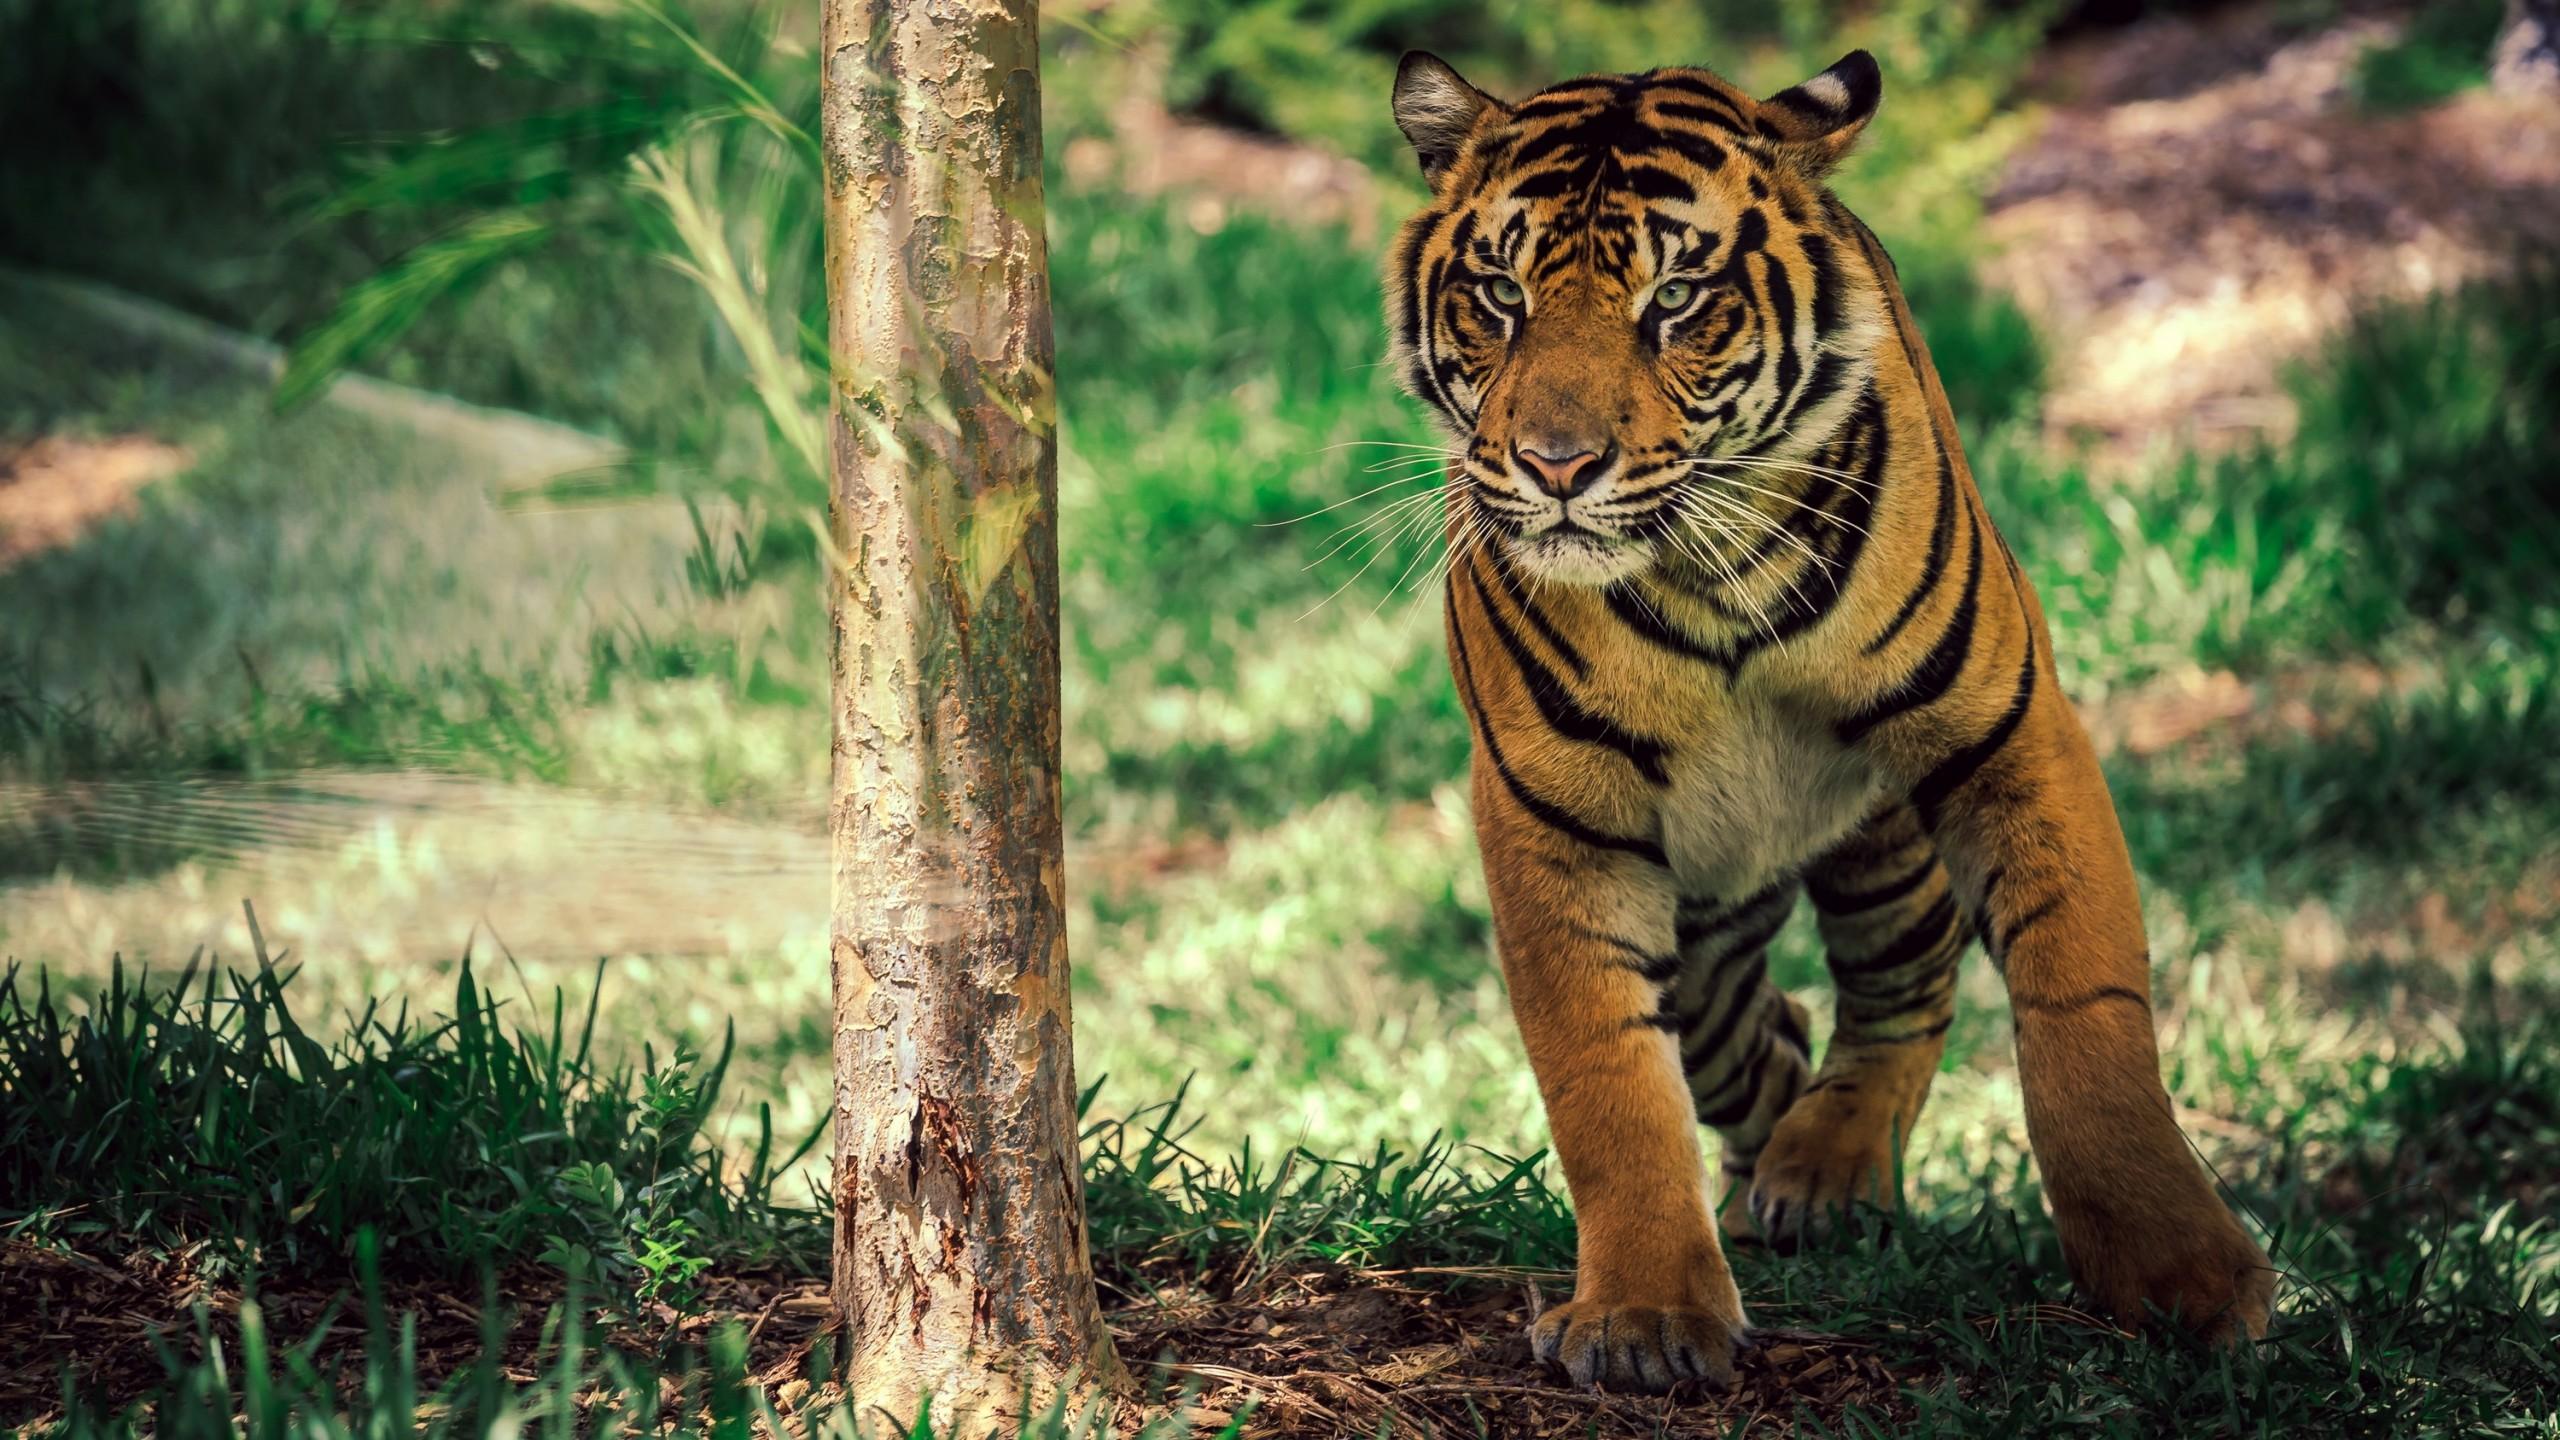 Wallpaper Tiger, Savanna, Cute Animals, Animals #4522